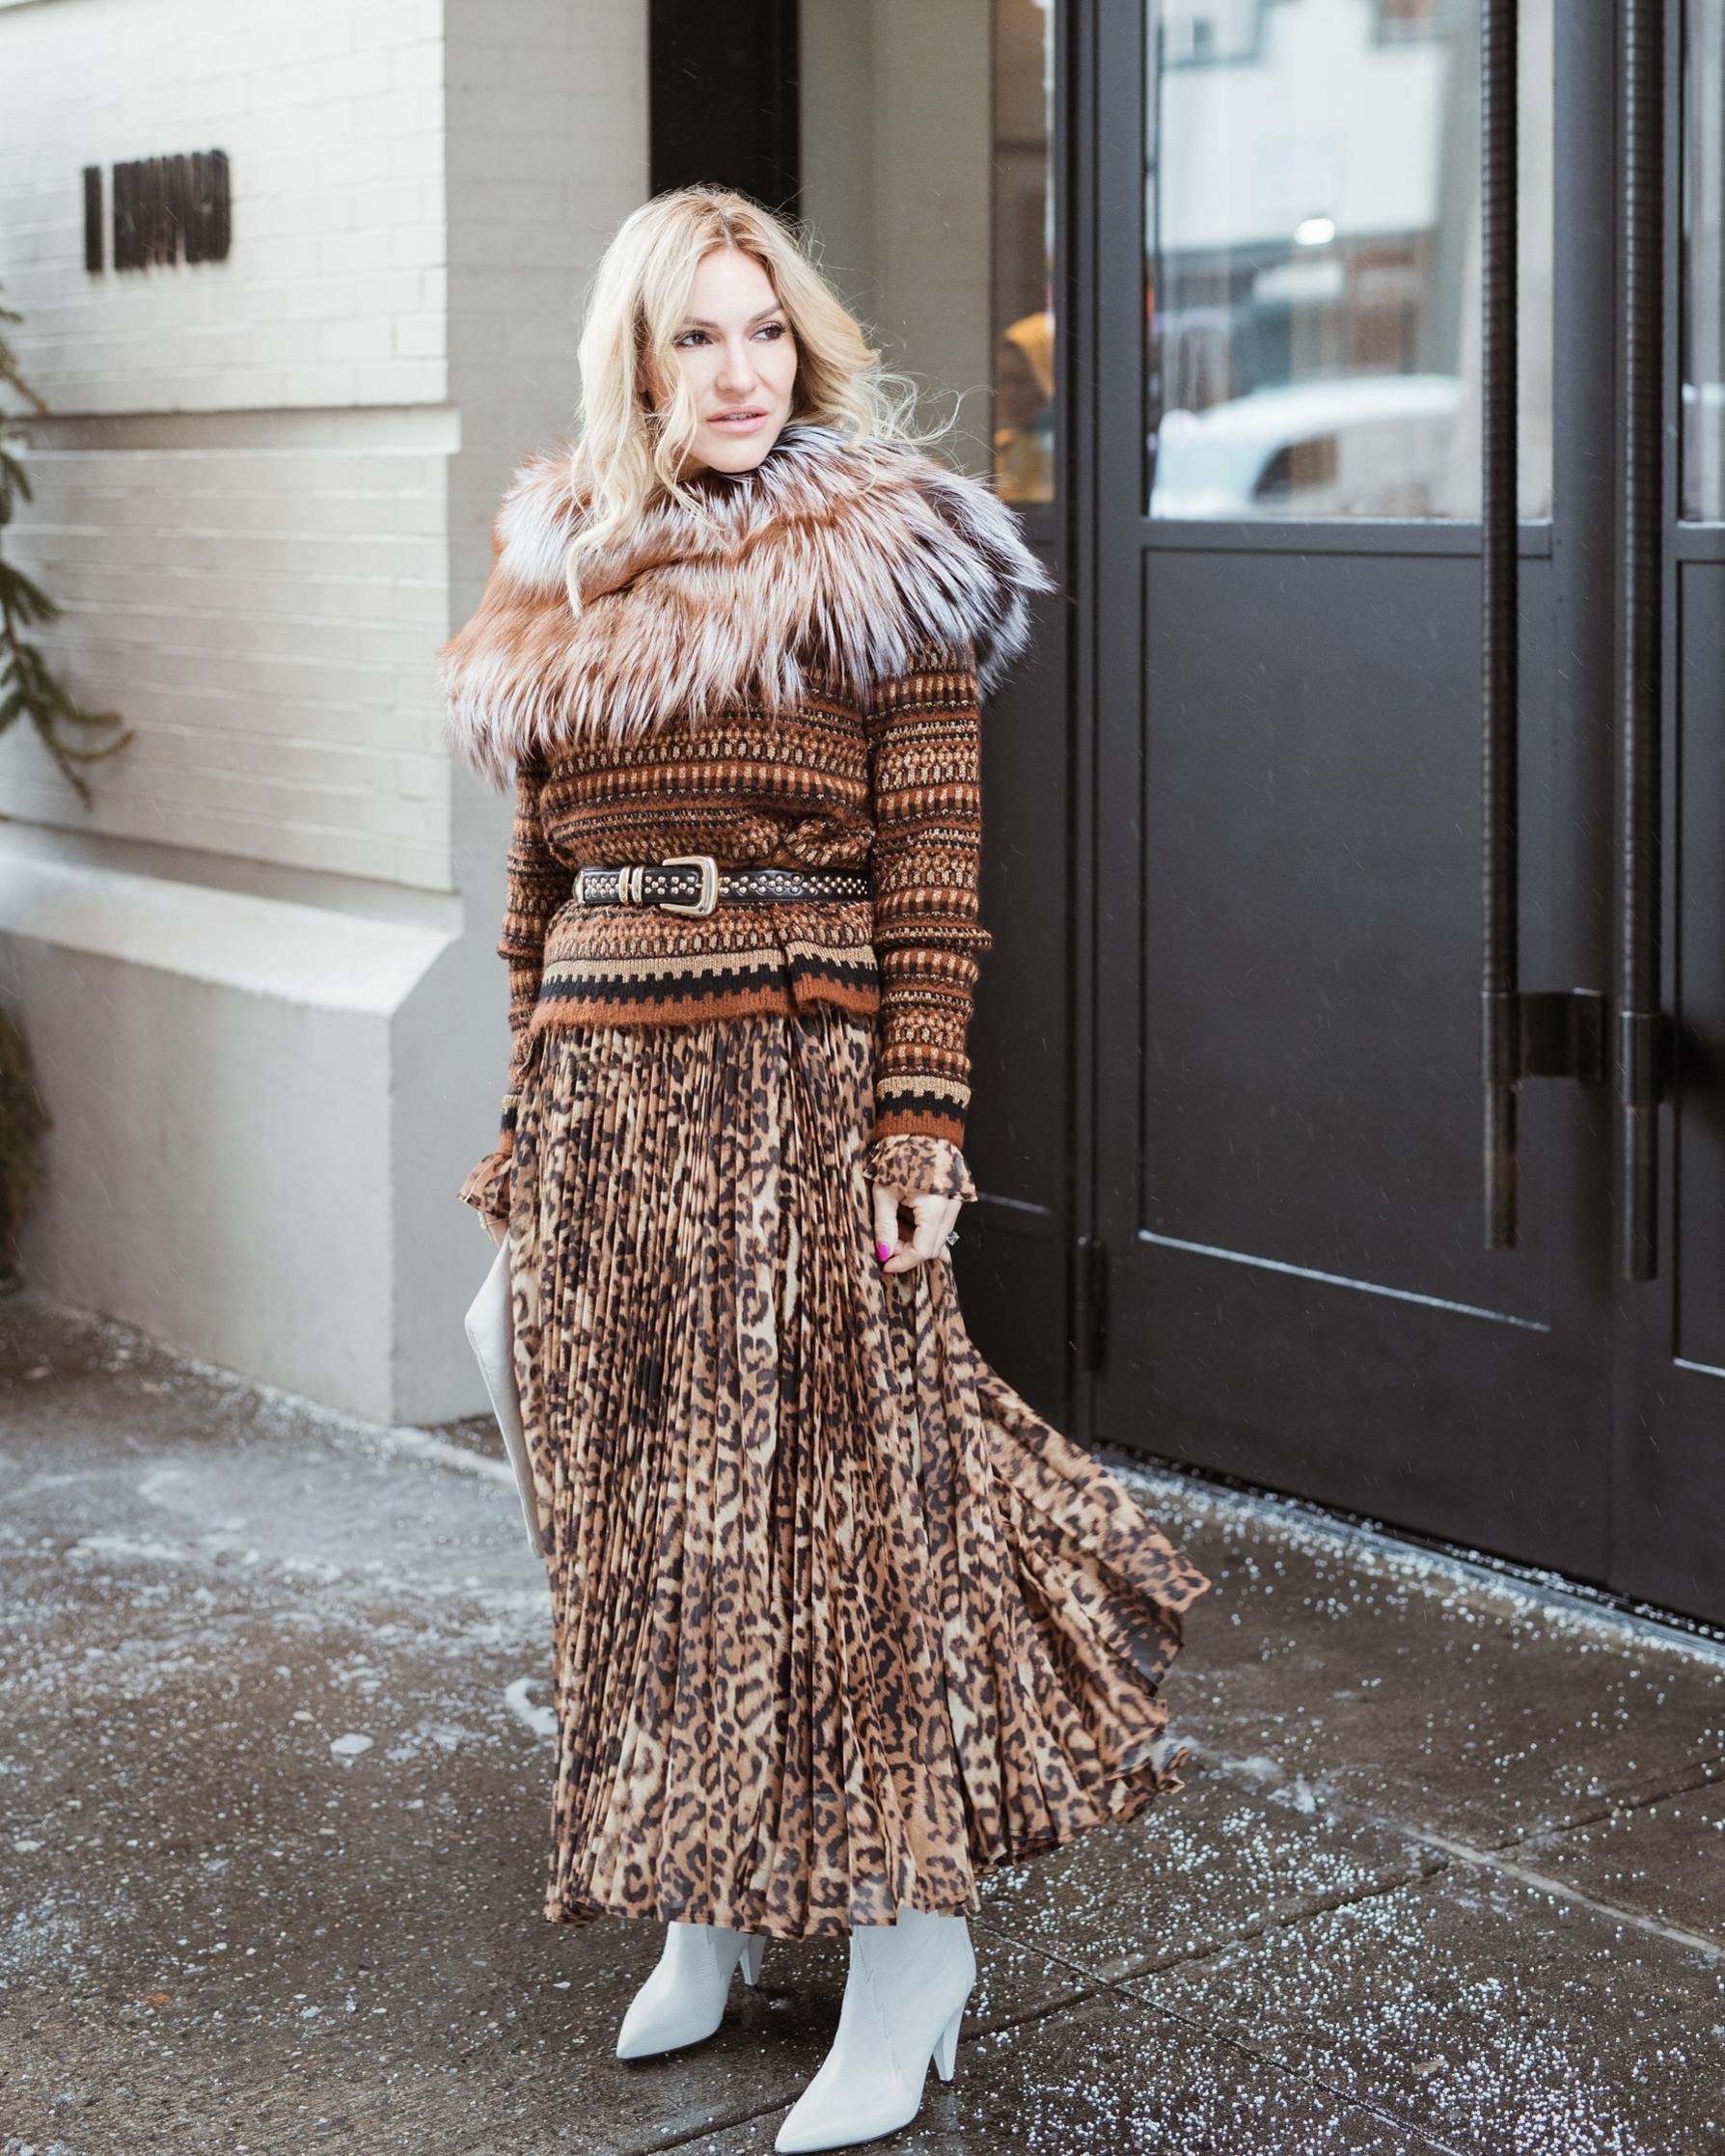 skirt:  H&M  - sweater:  Zara  - fur:  Lysa Lash Fur  - belt: Vintage